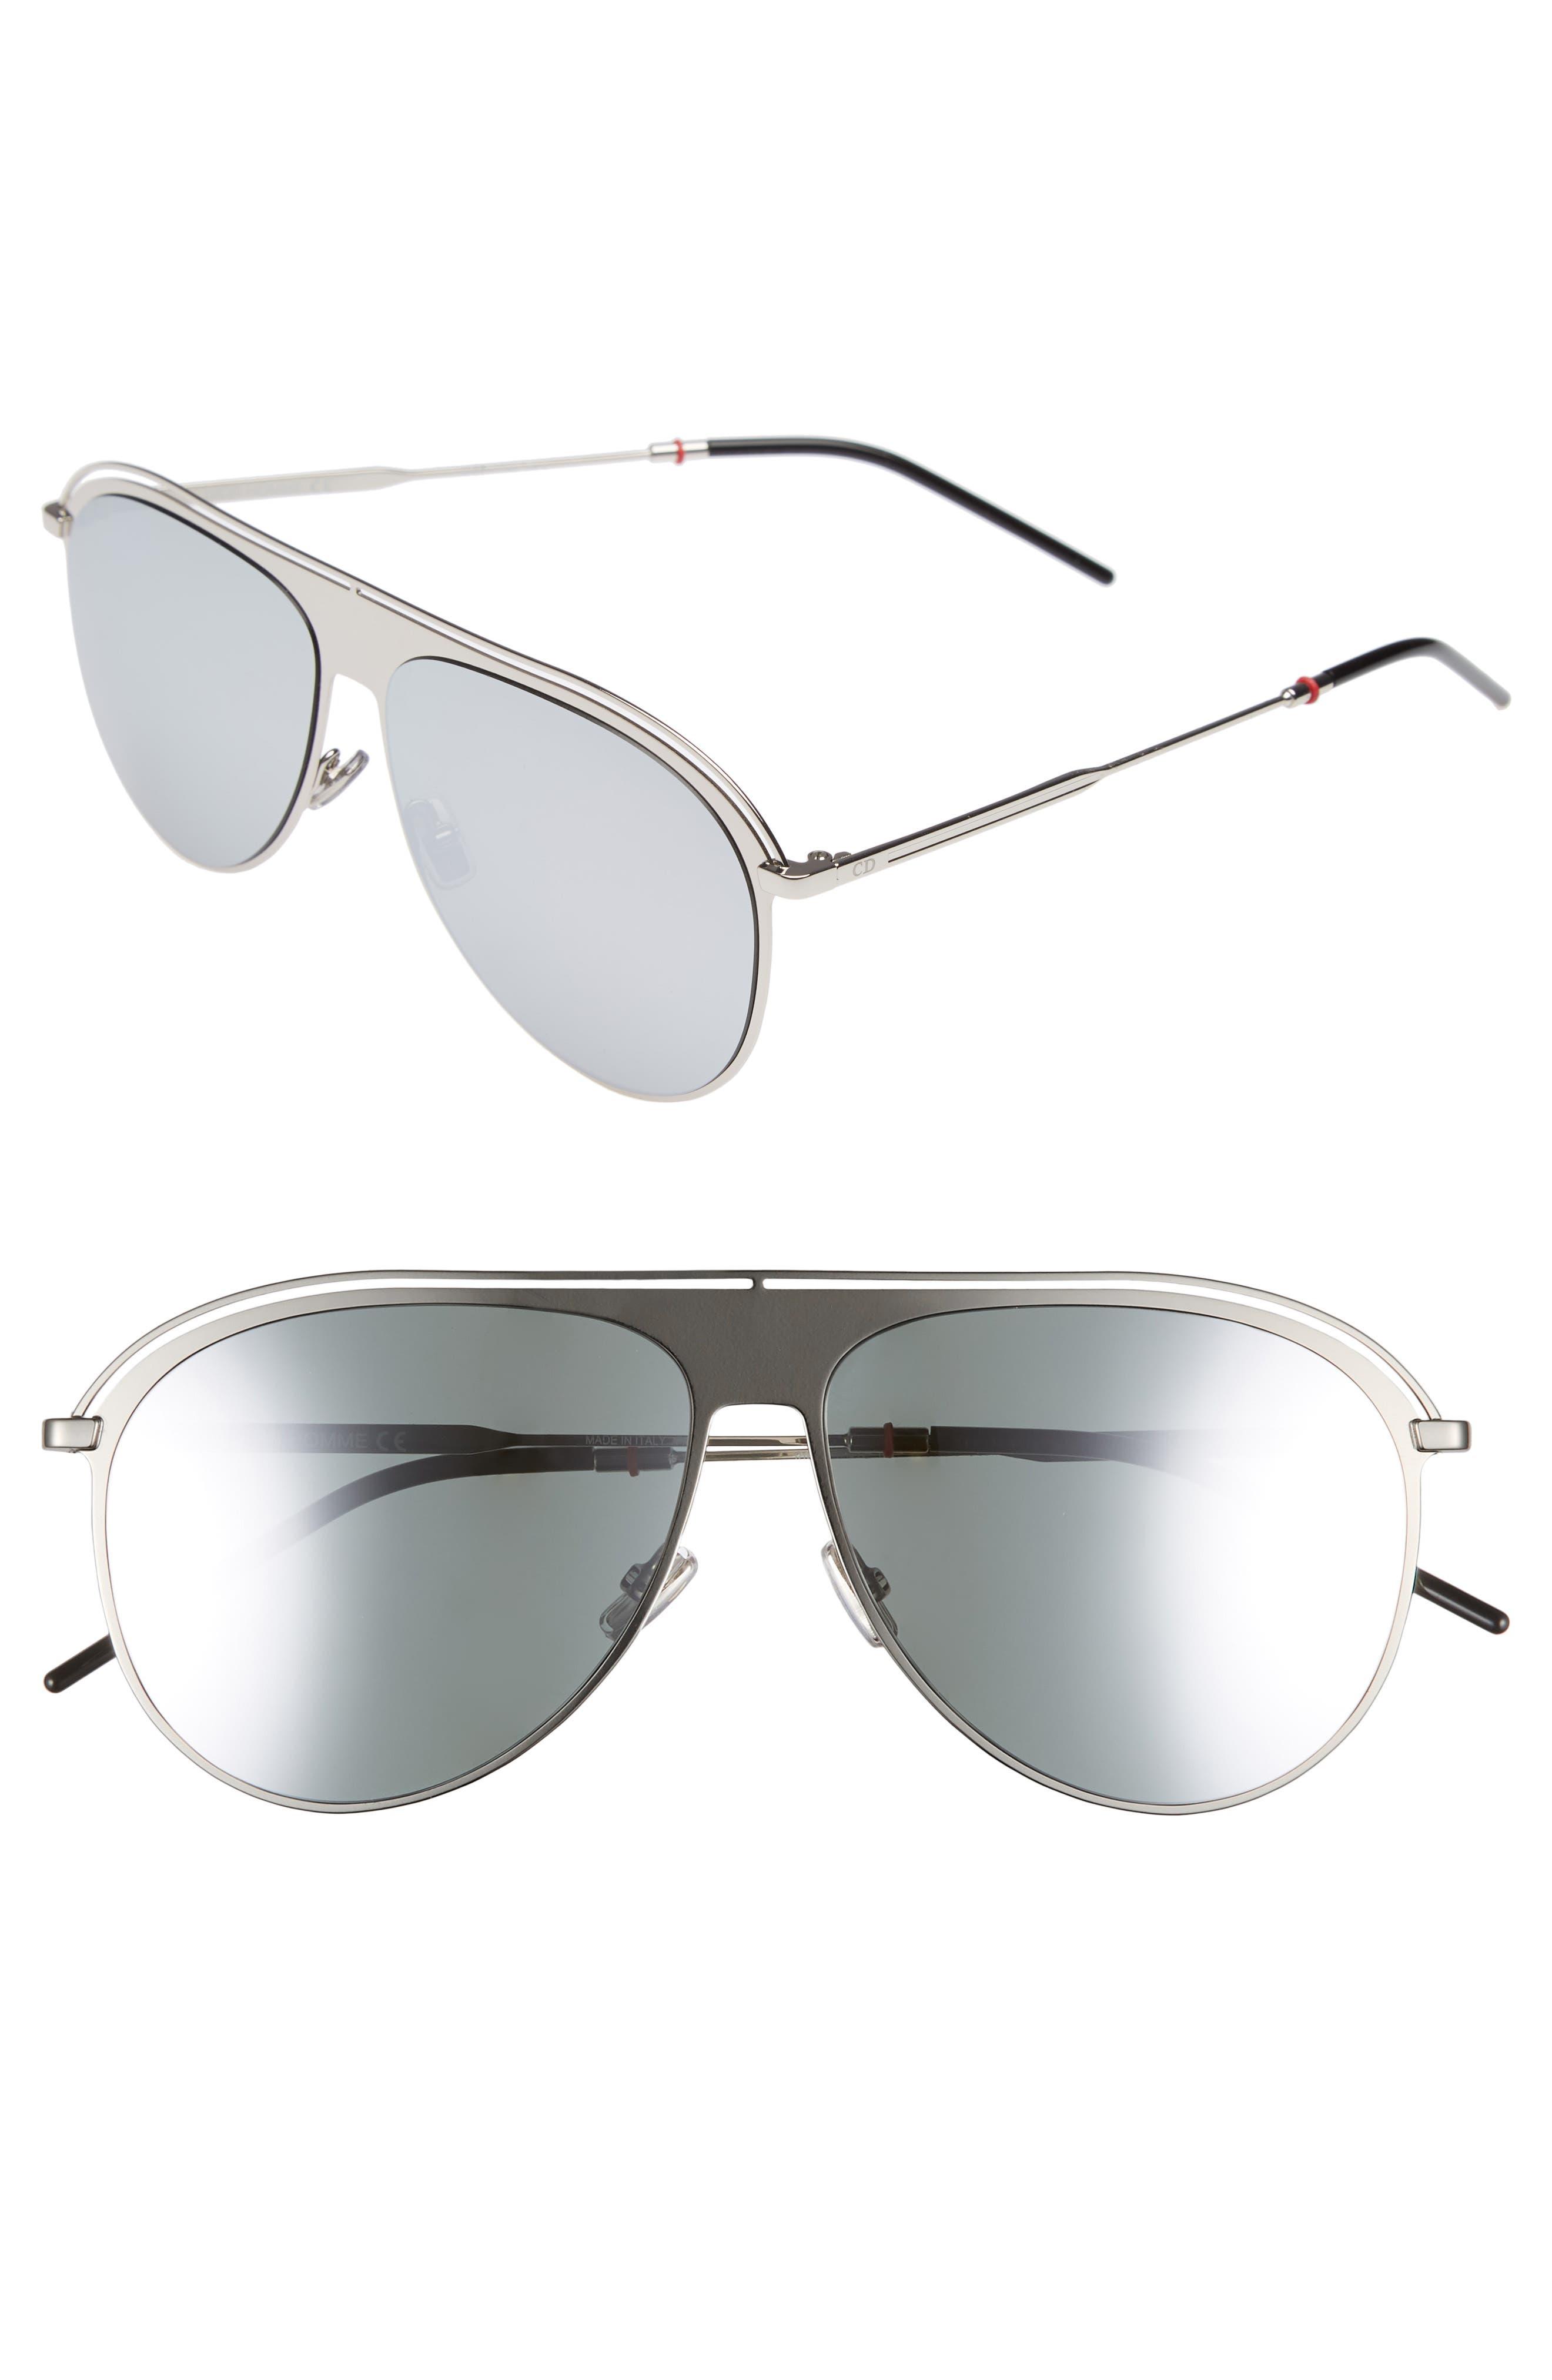 Dior Homme 59mm Polarized Aviator Sunglasses